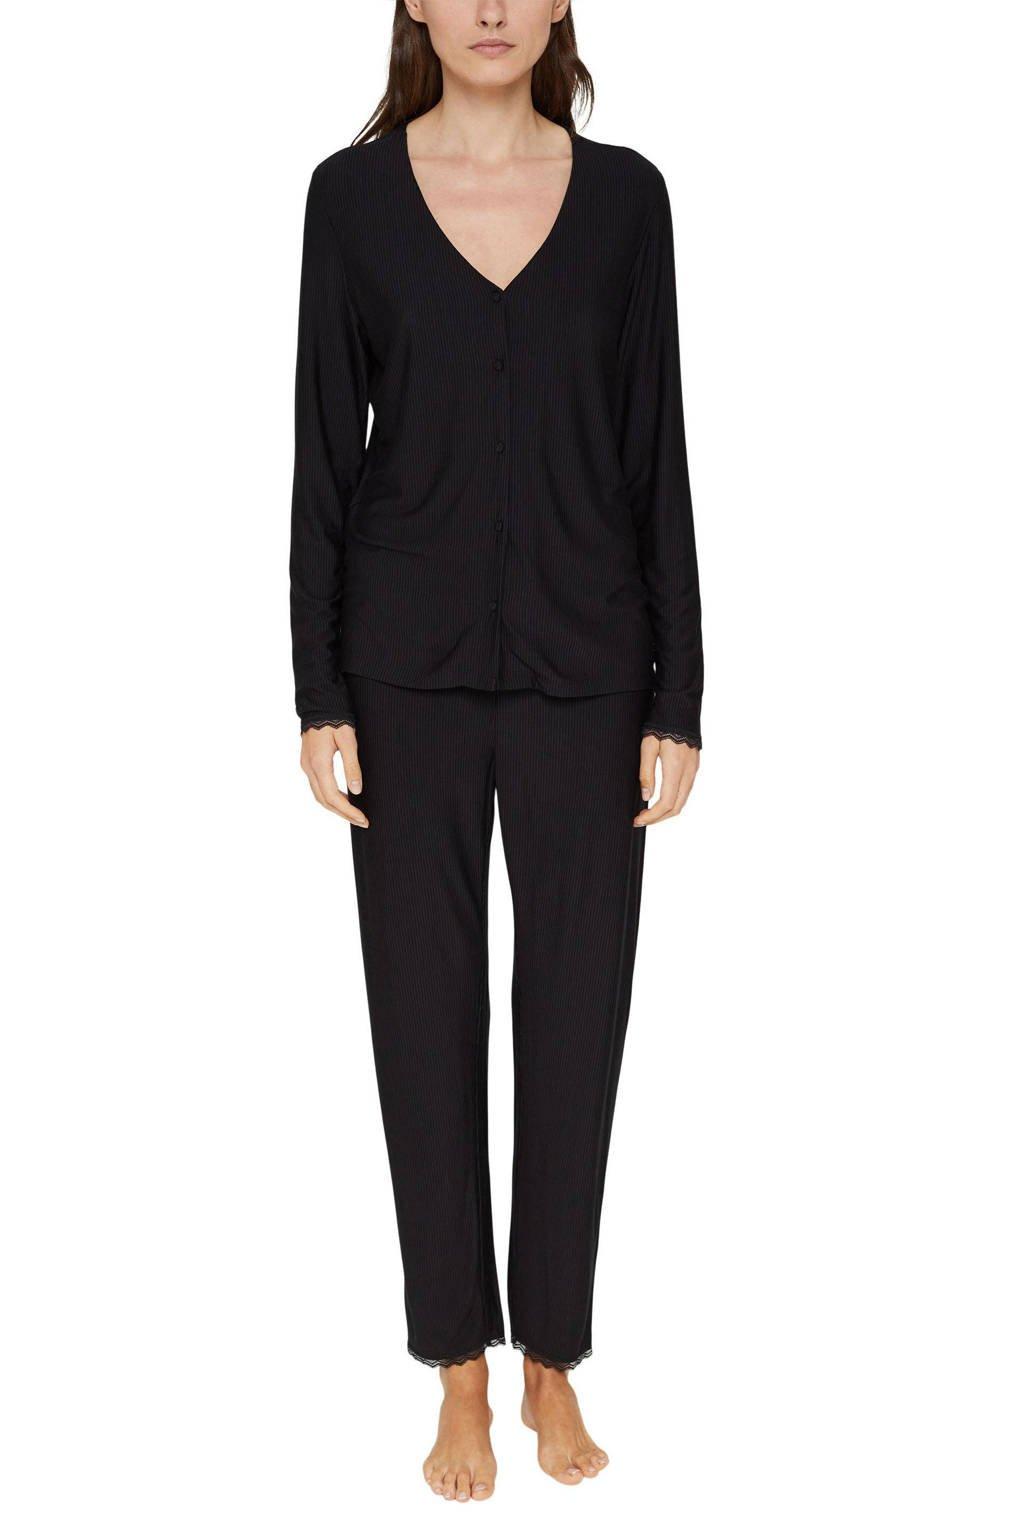 ESPRIT Women Bodywear pyjama zwart, Zwart